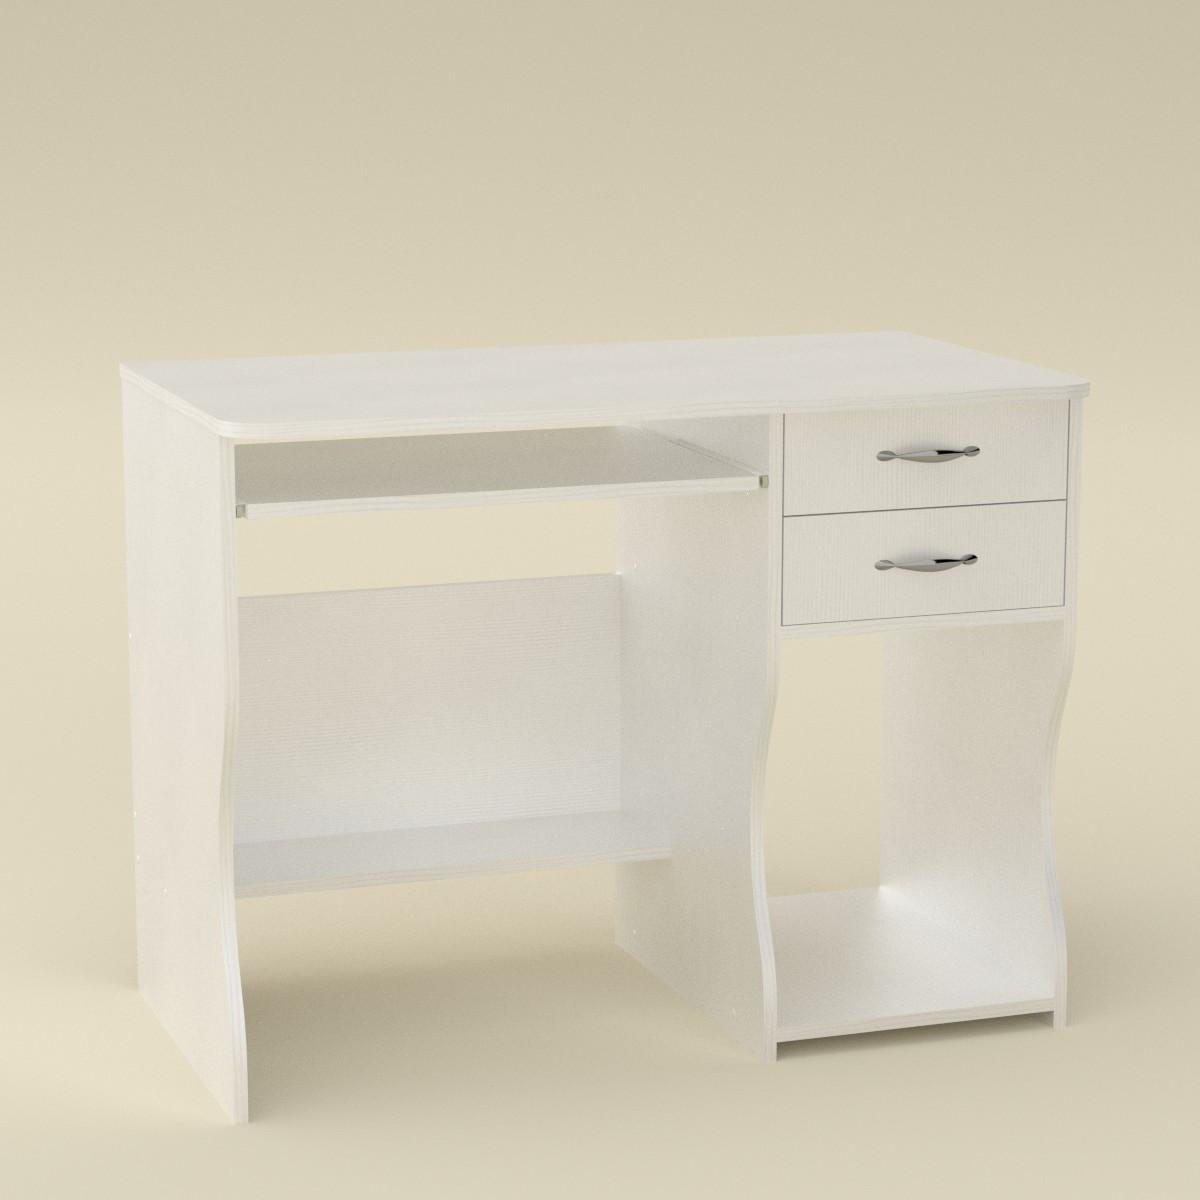 Стол компьютерный СКМ-7 белый Компанит (100х55х77 см)